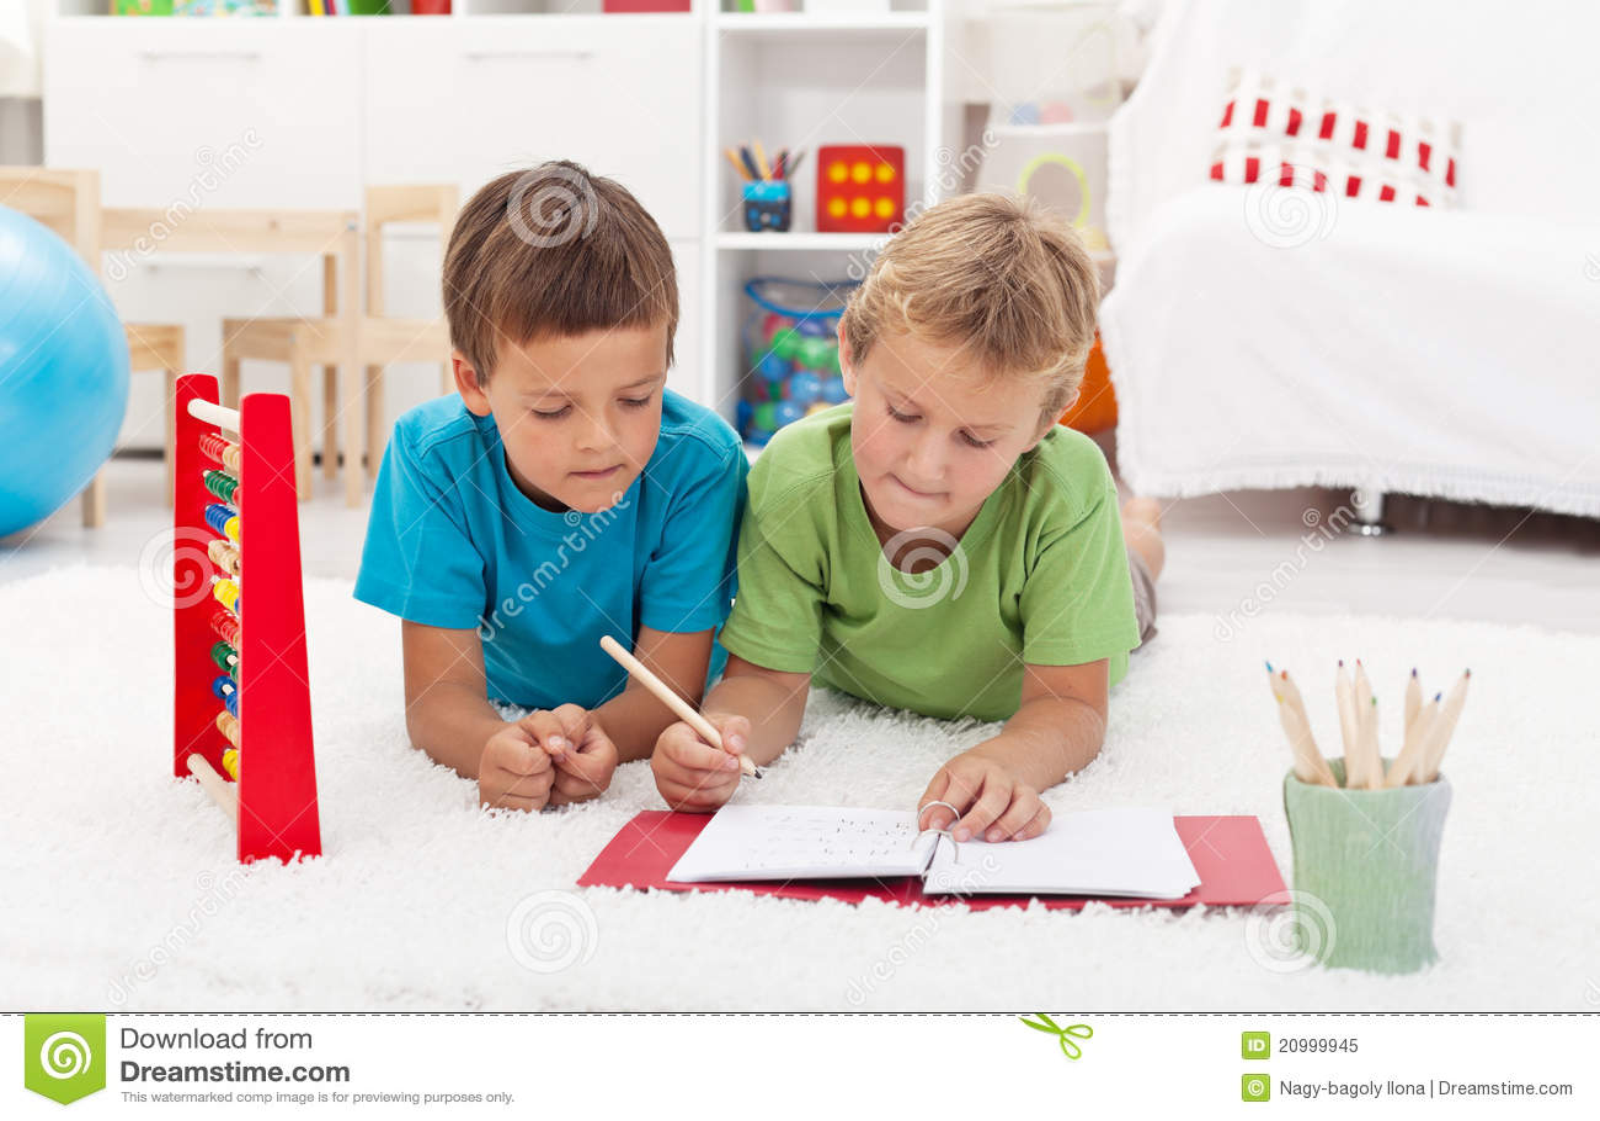 kids doing math exercises on the floor stock image